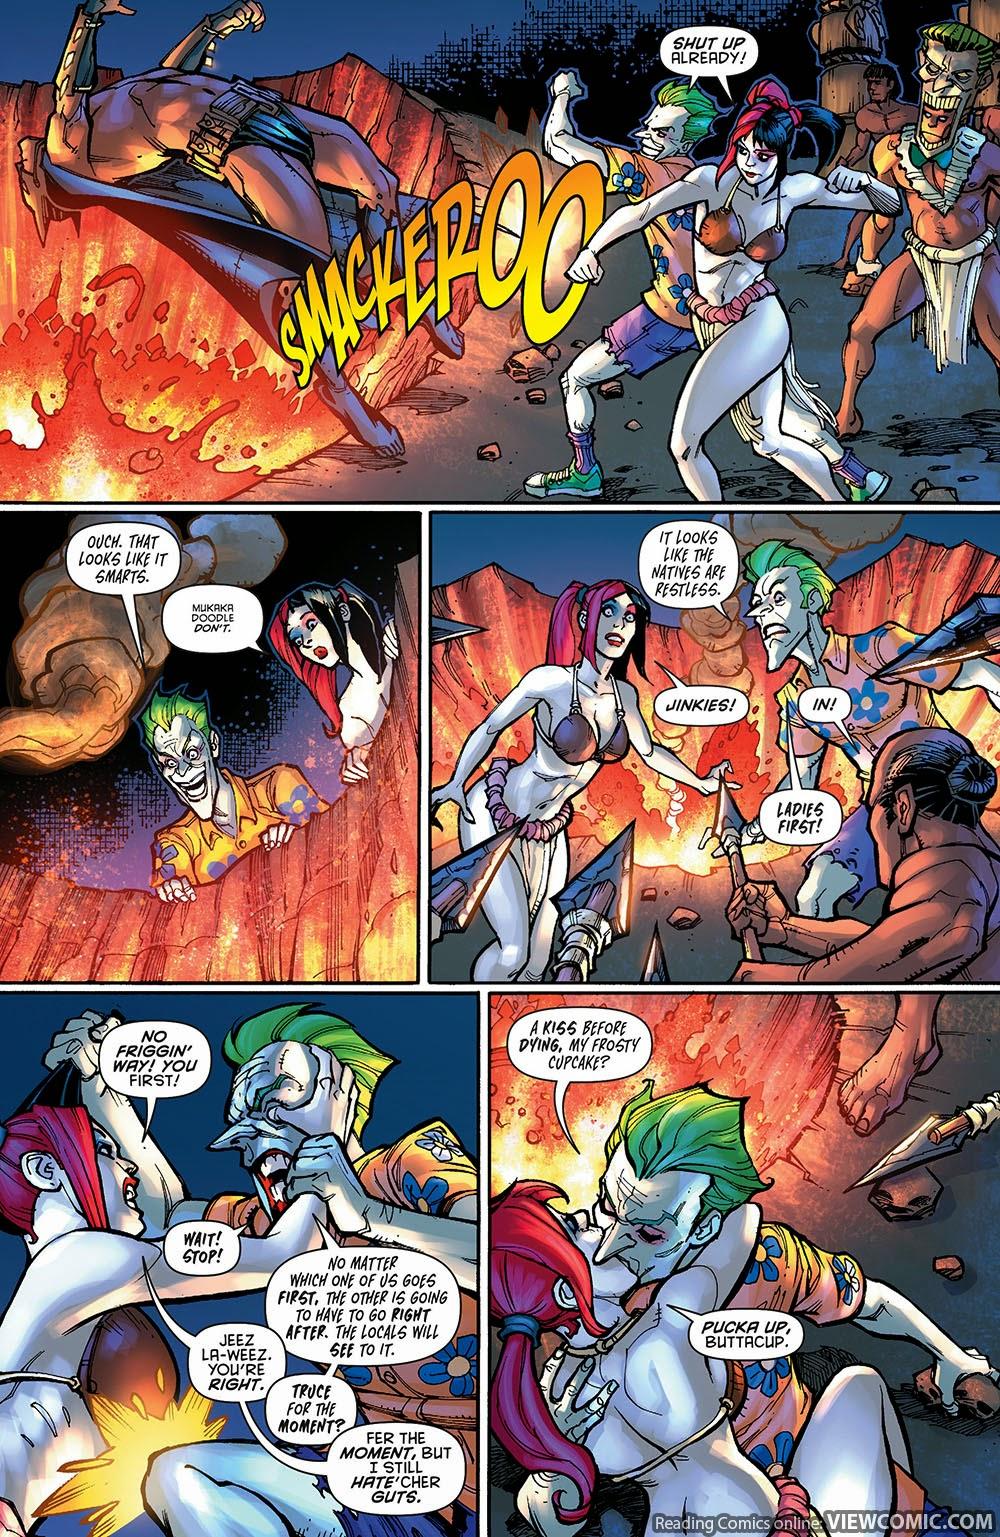 harley quinn futures end 001 2014 viewcomic reading comics